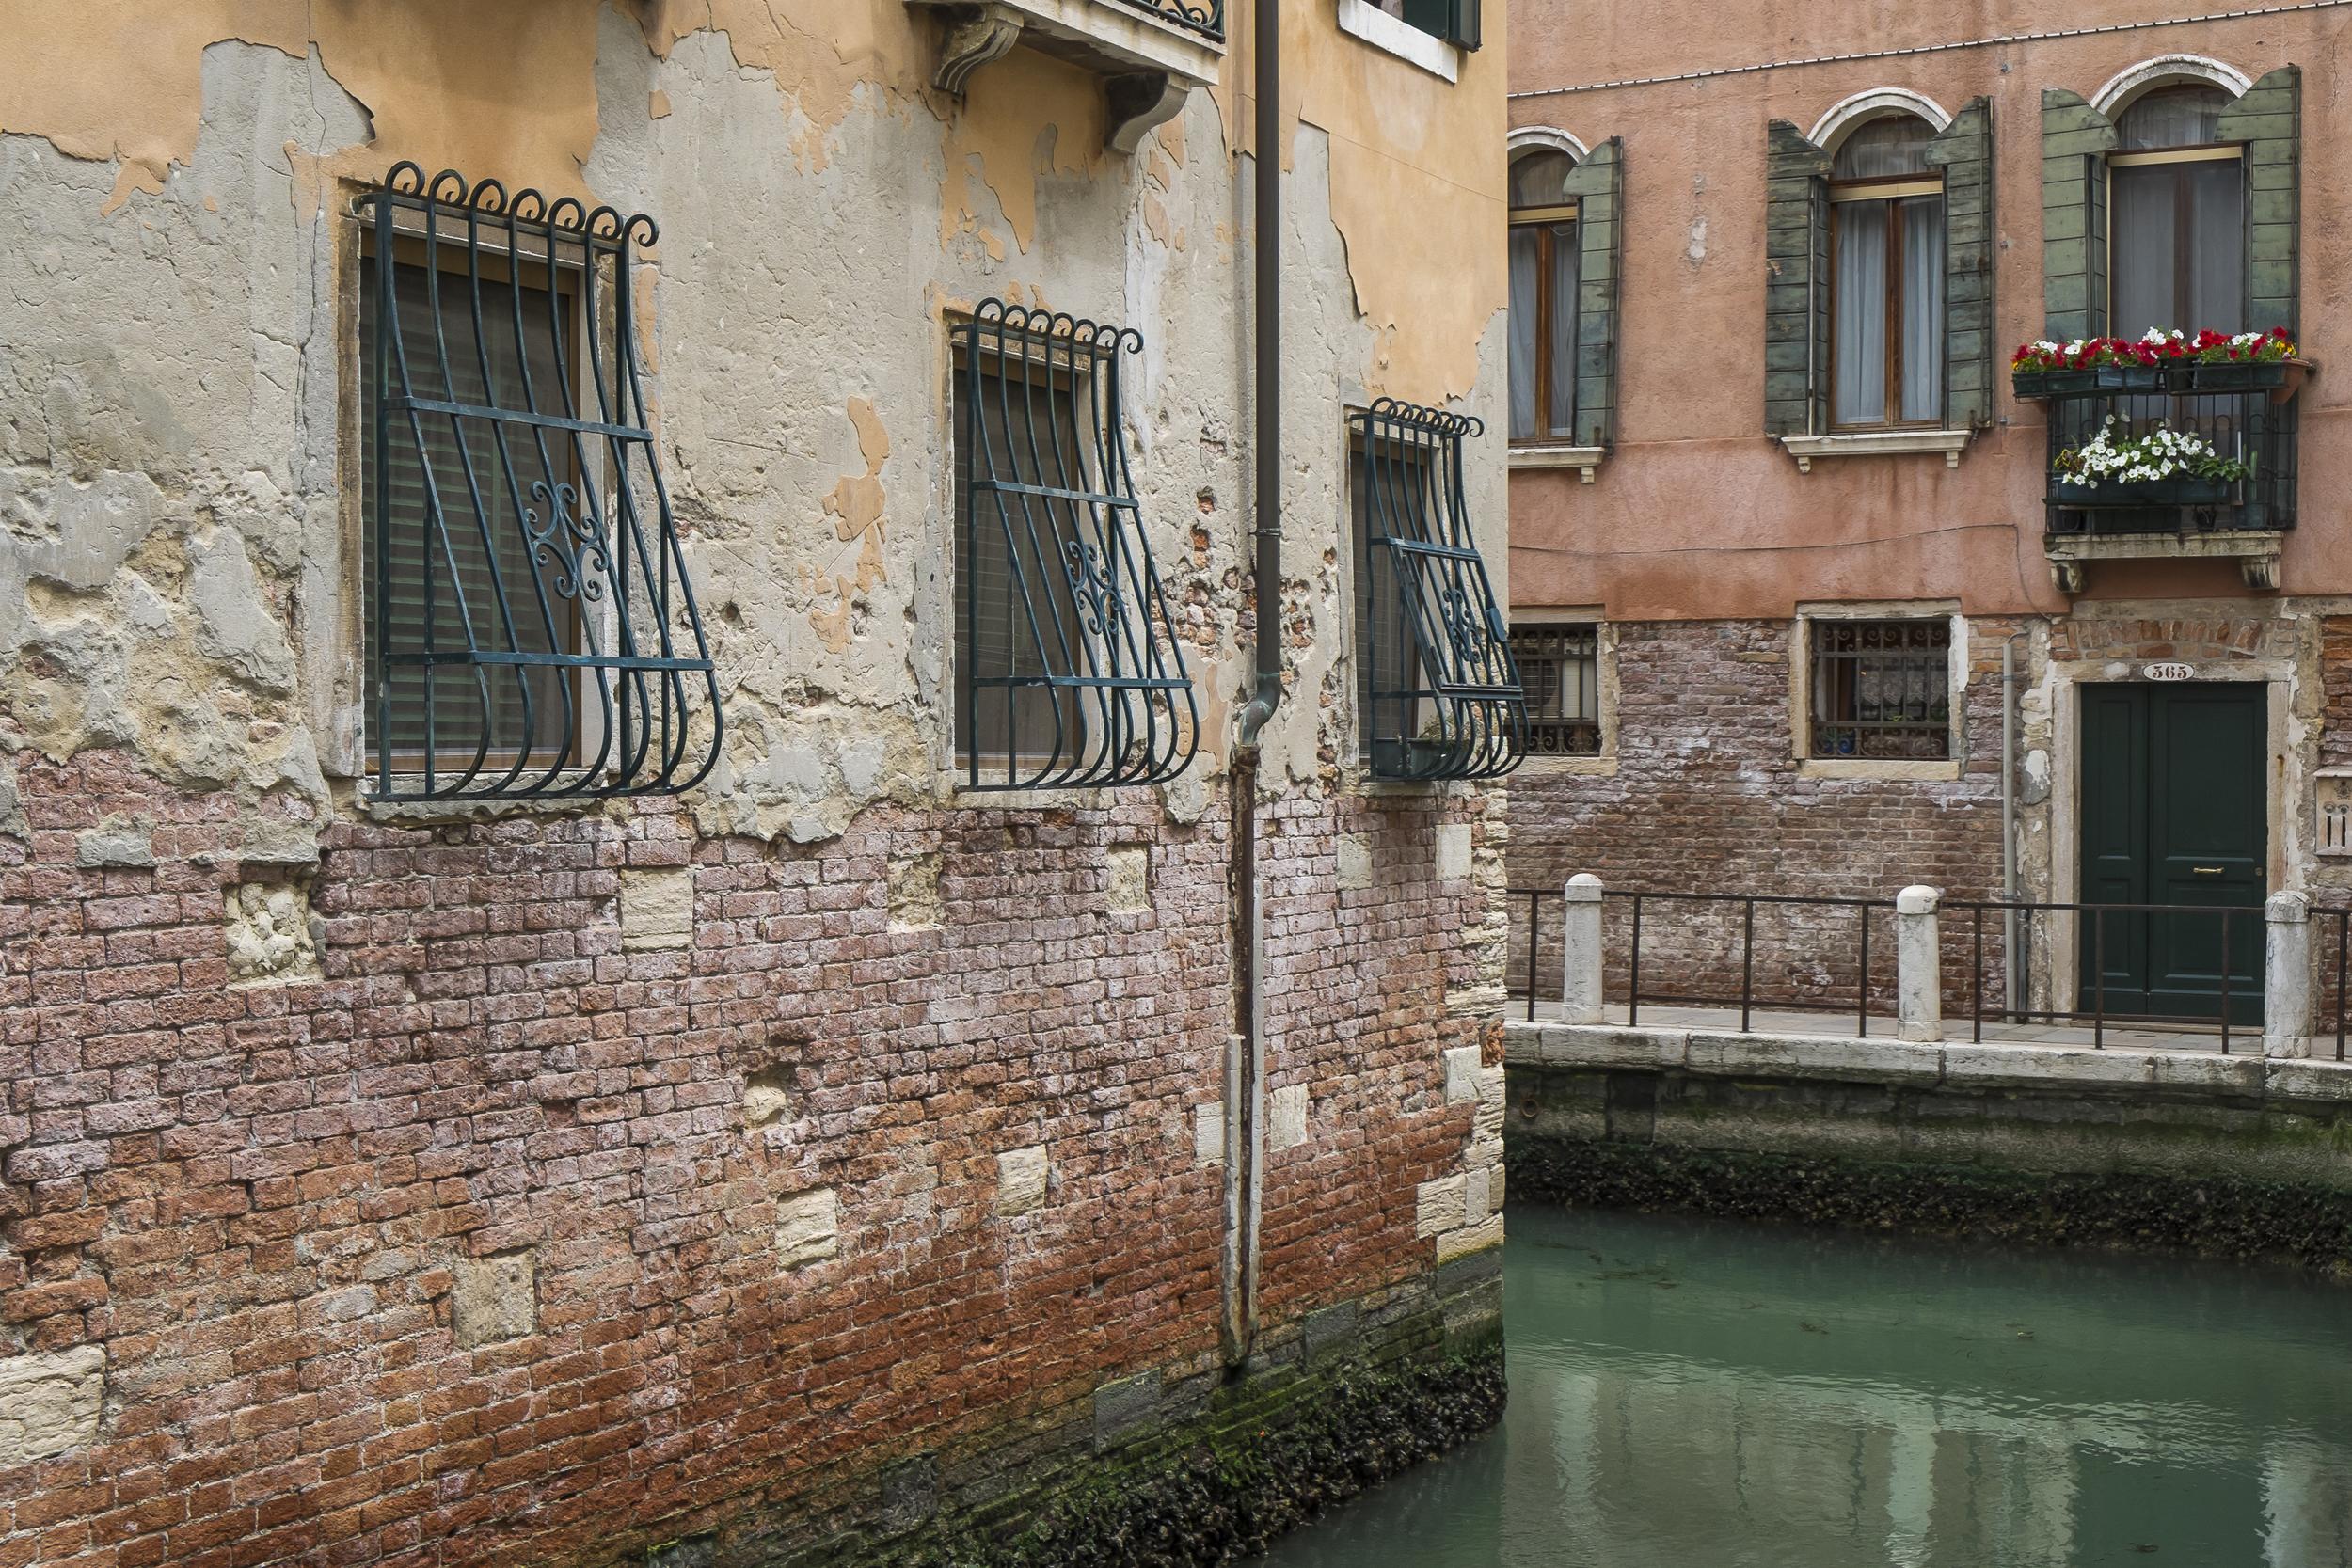 Venice-CanalCorner-20140523-DSCF5874.jpg